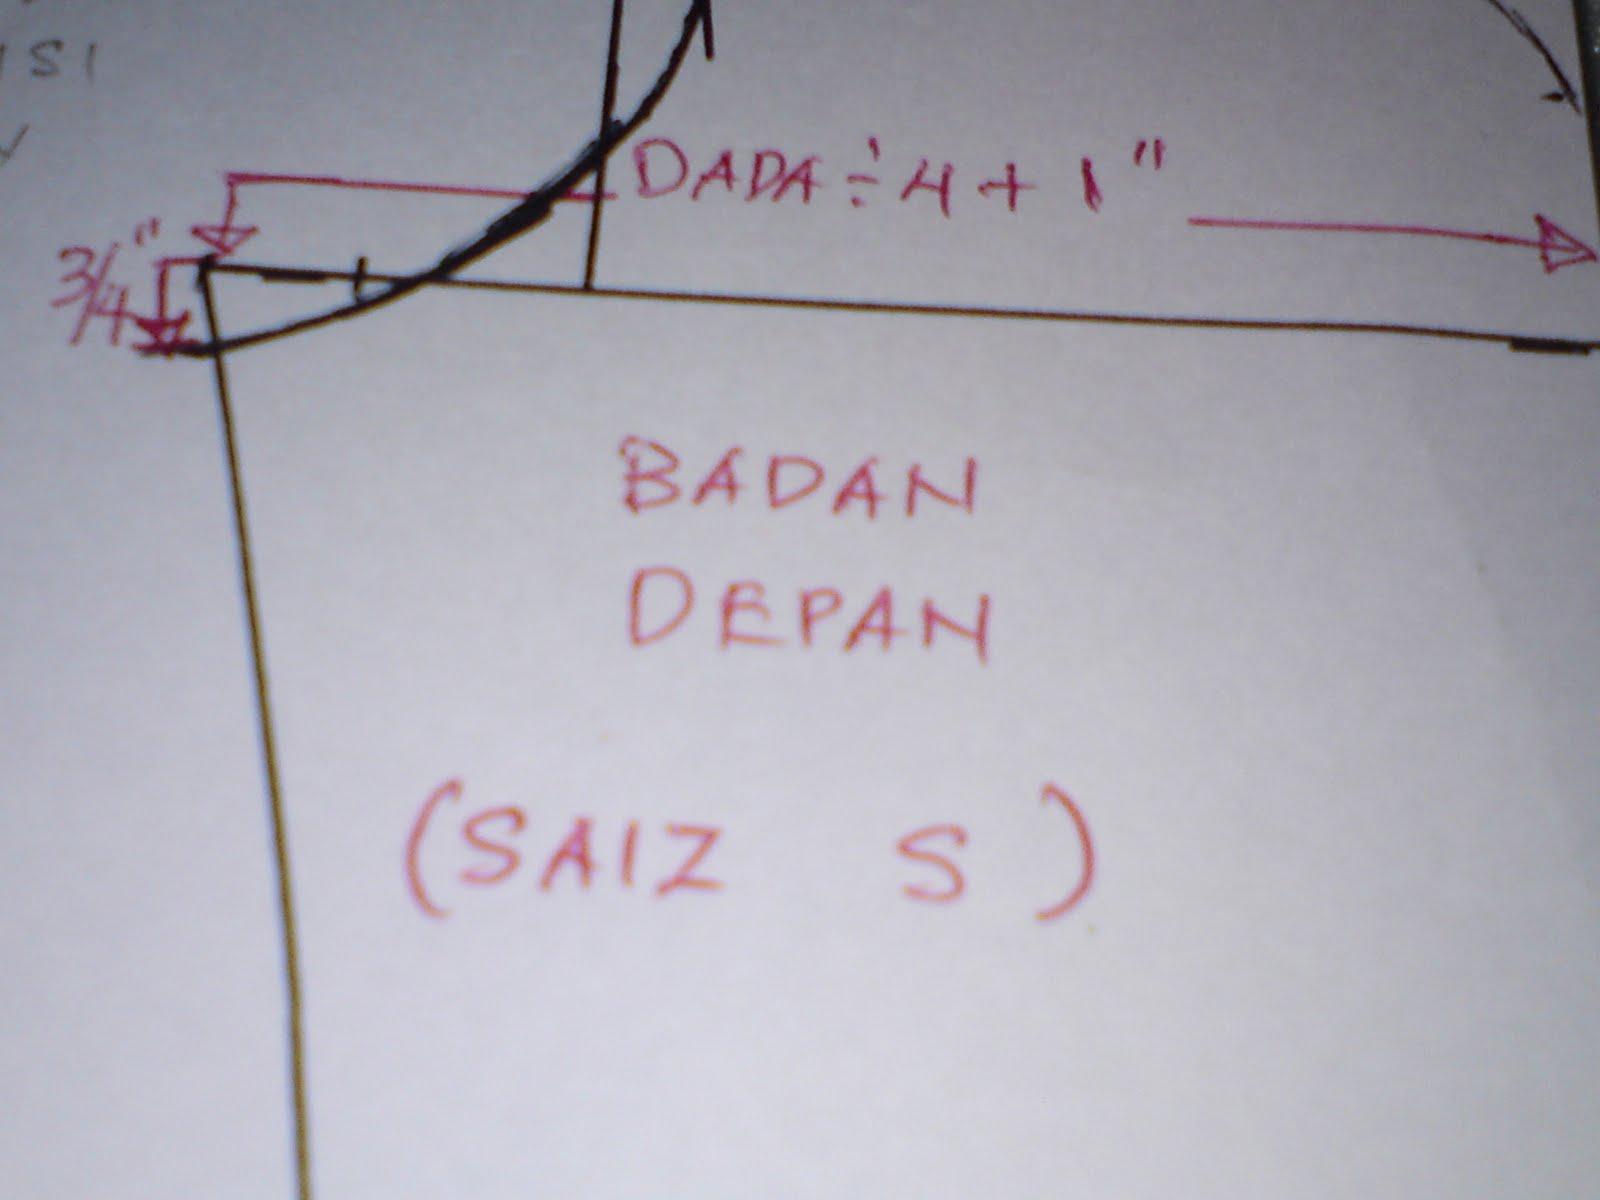 "... : Cara-cara membuat lubang lengan dan tangan utk saiz ""S"",""M"" dan ""L"